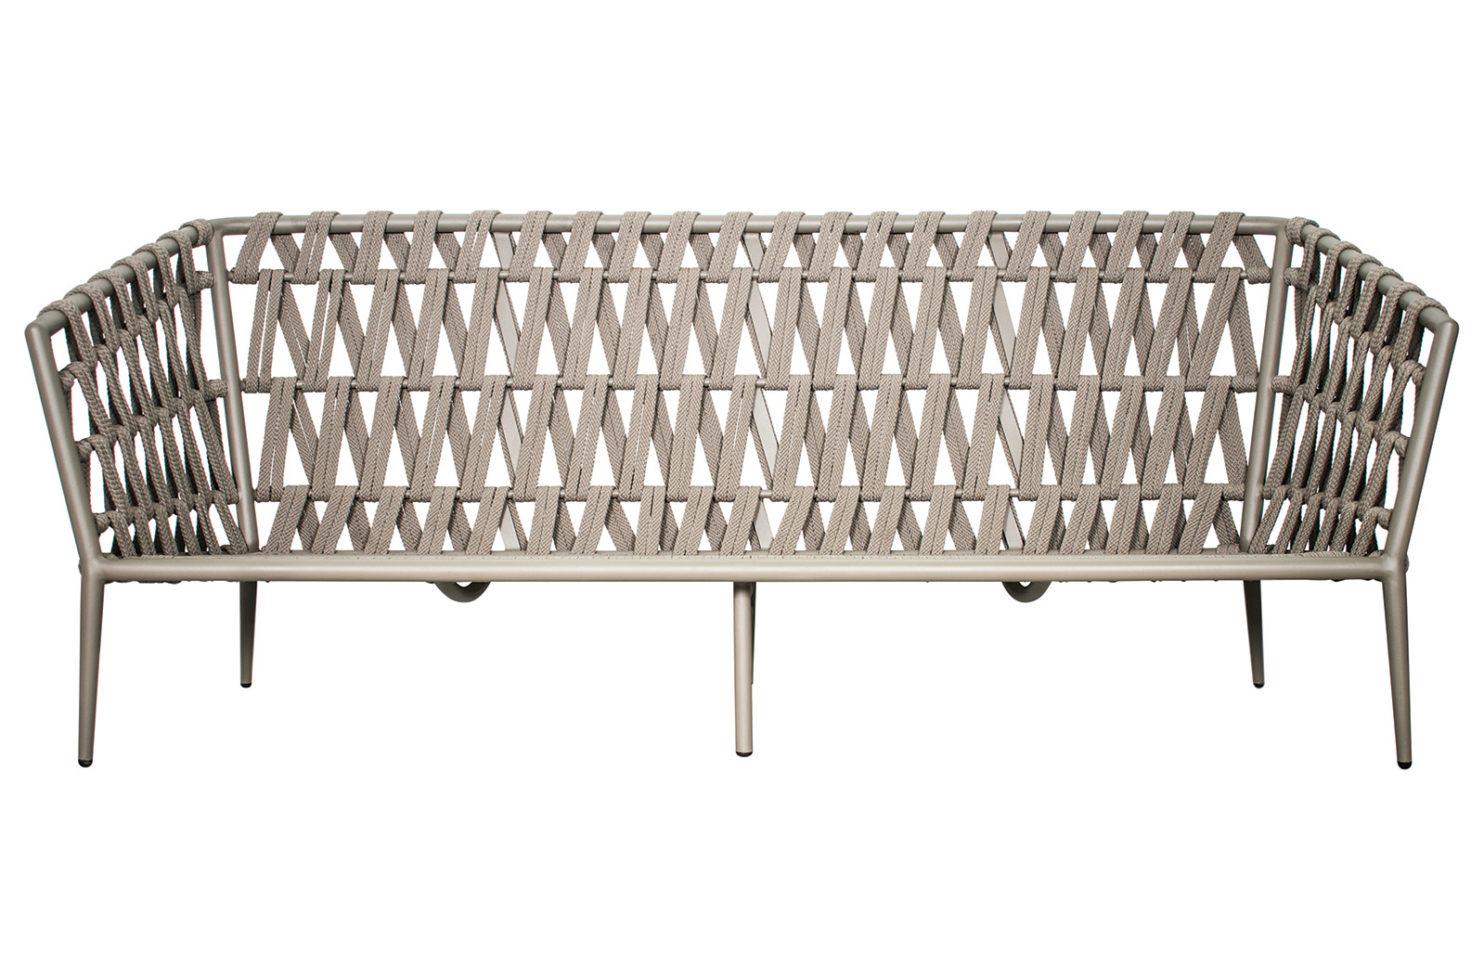 Archipelago andaman sofa 620FT066P2LGT frame 1 front